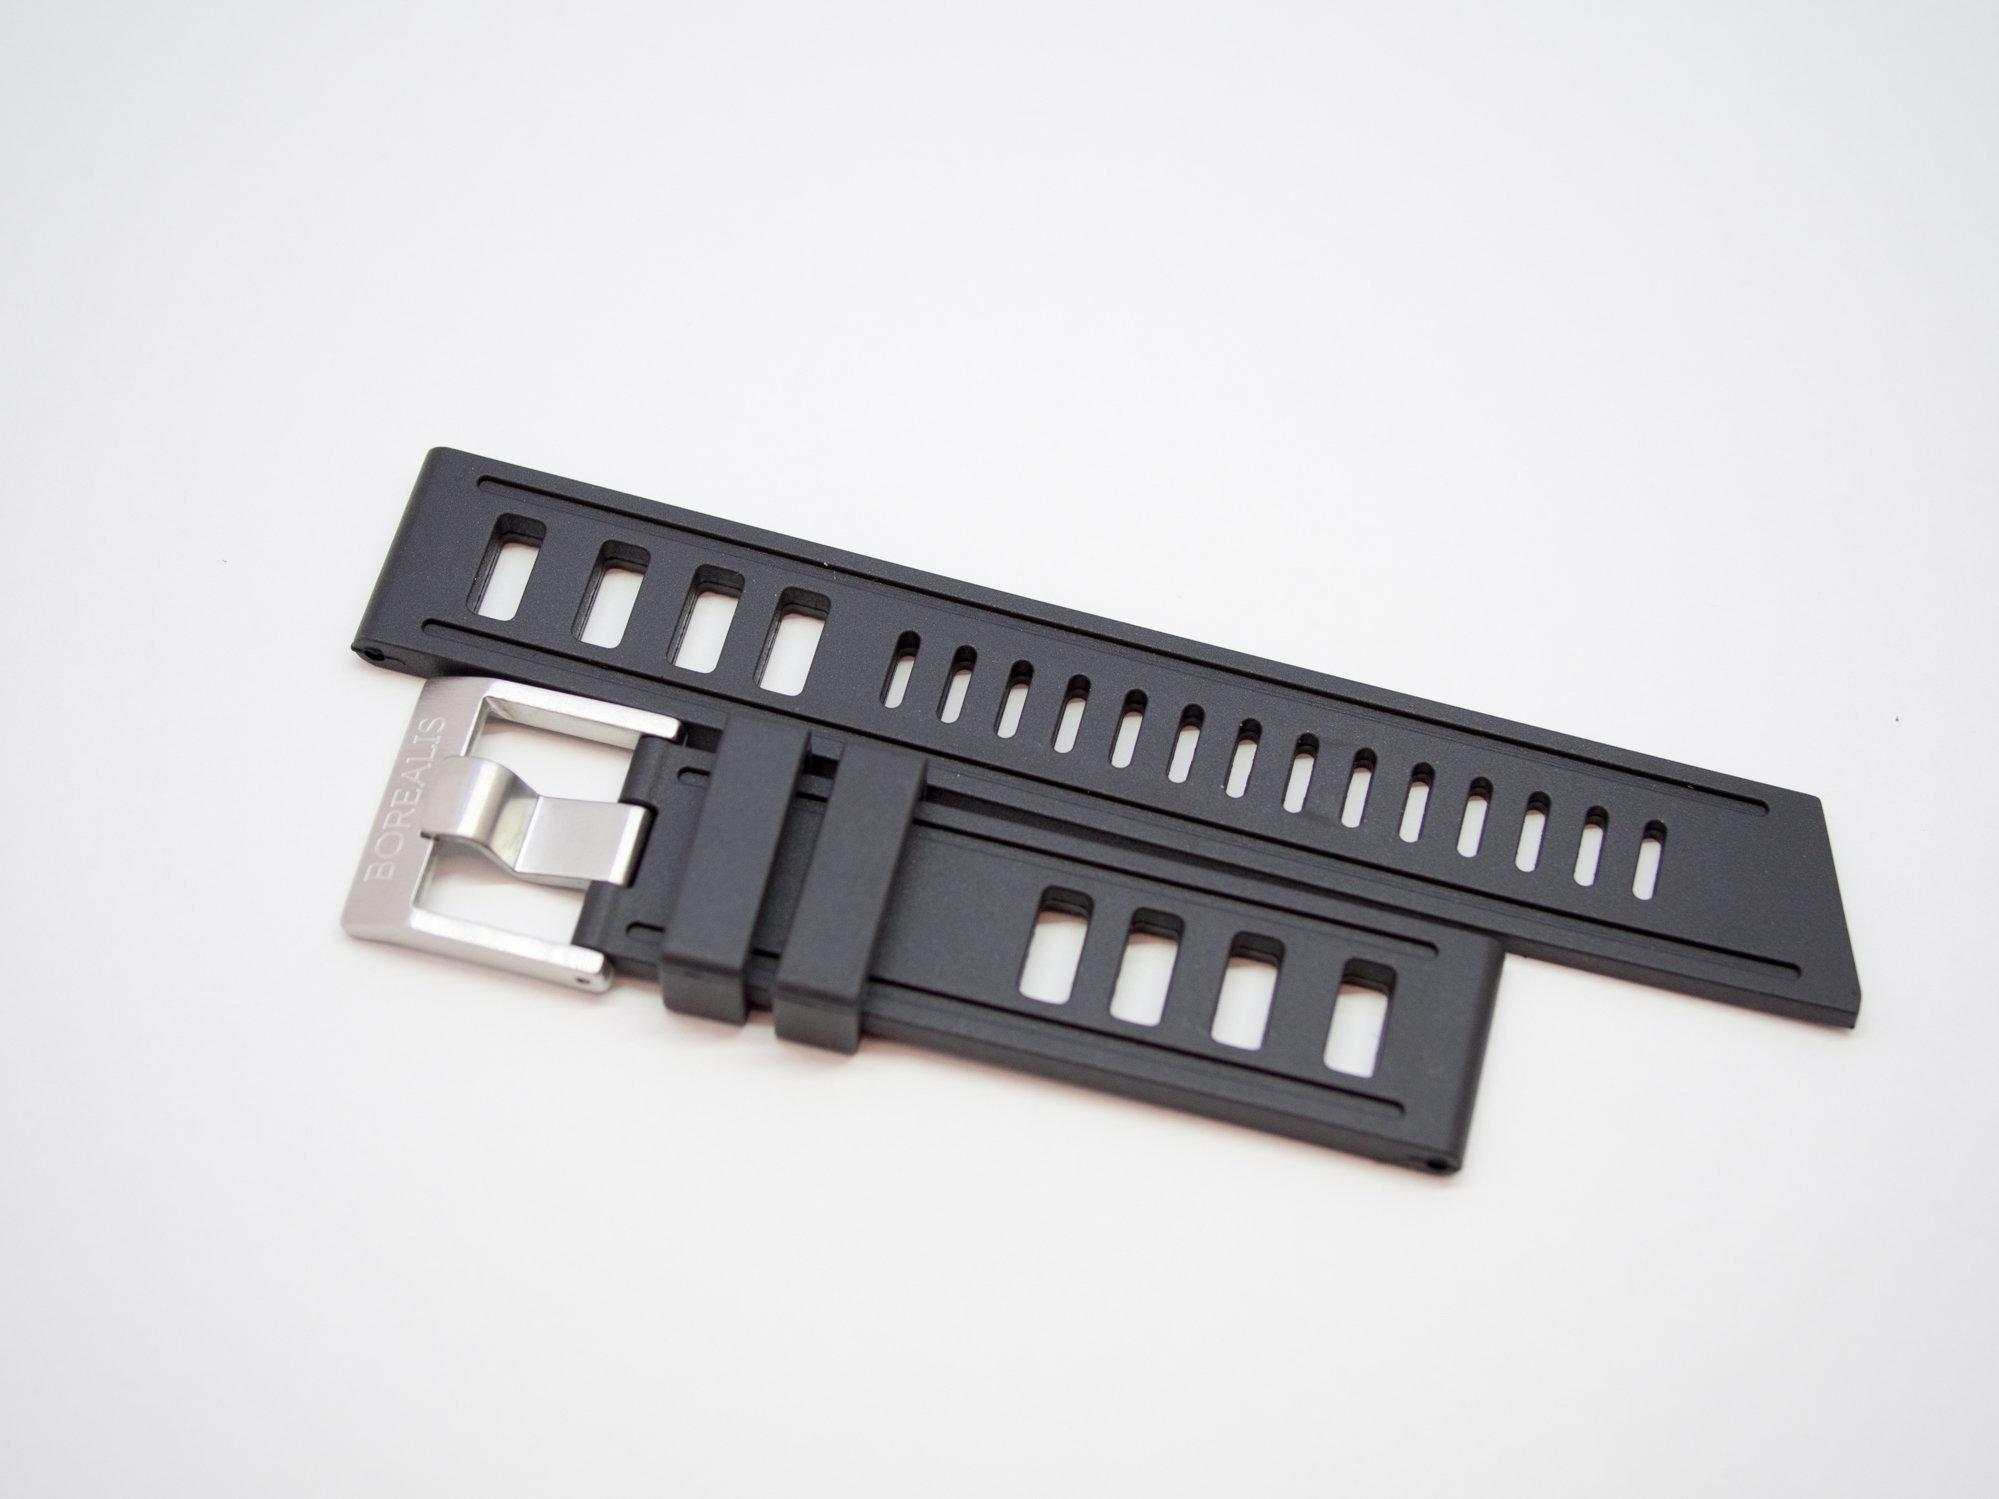 Borealis Vulcanized Rubber Strap 20mm Black - Best Offer in Market for Diver Watches BRSBLACK20